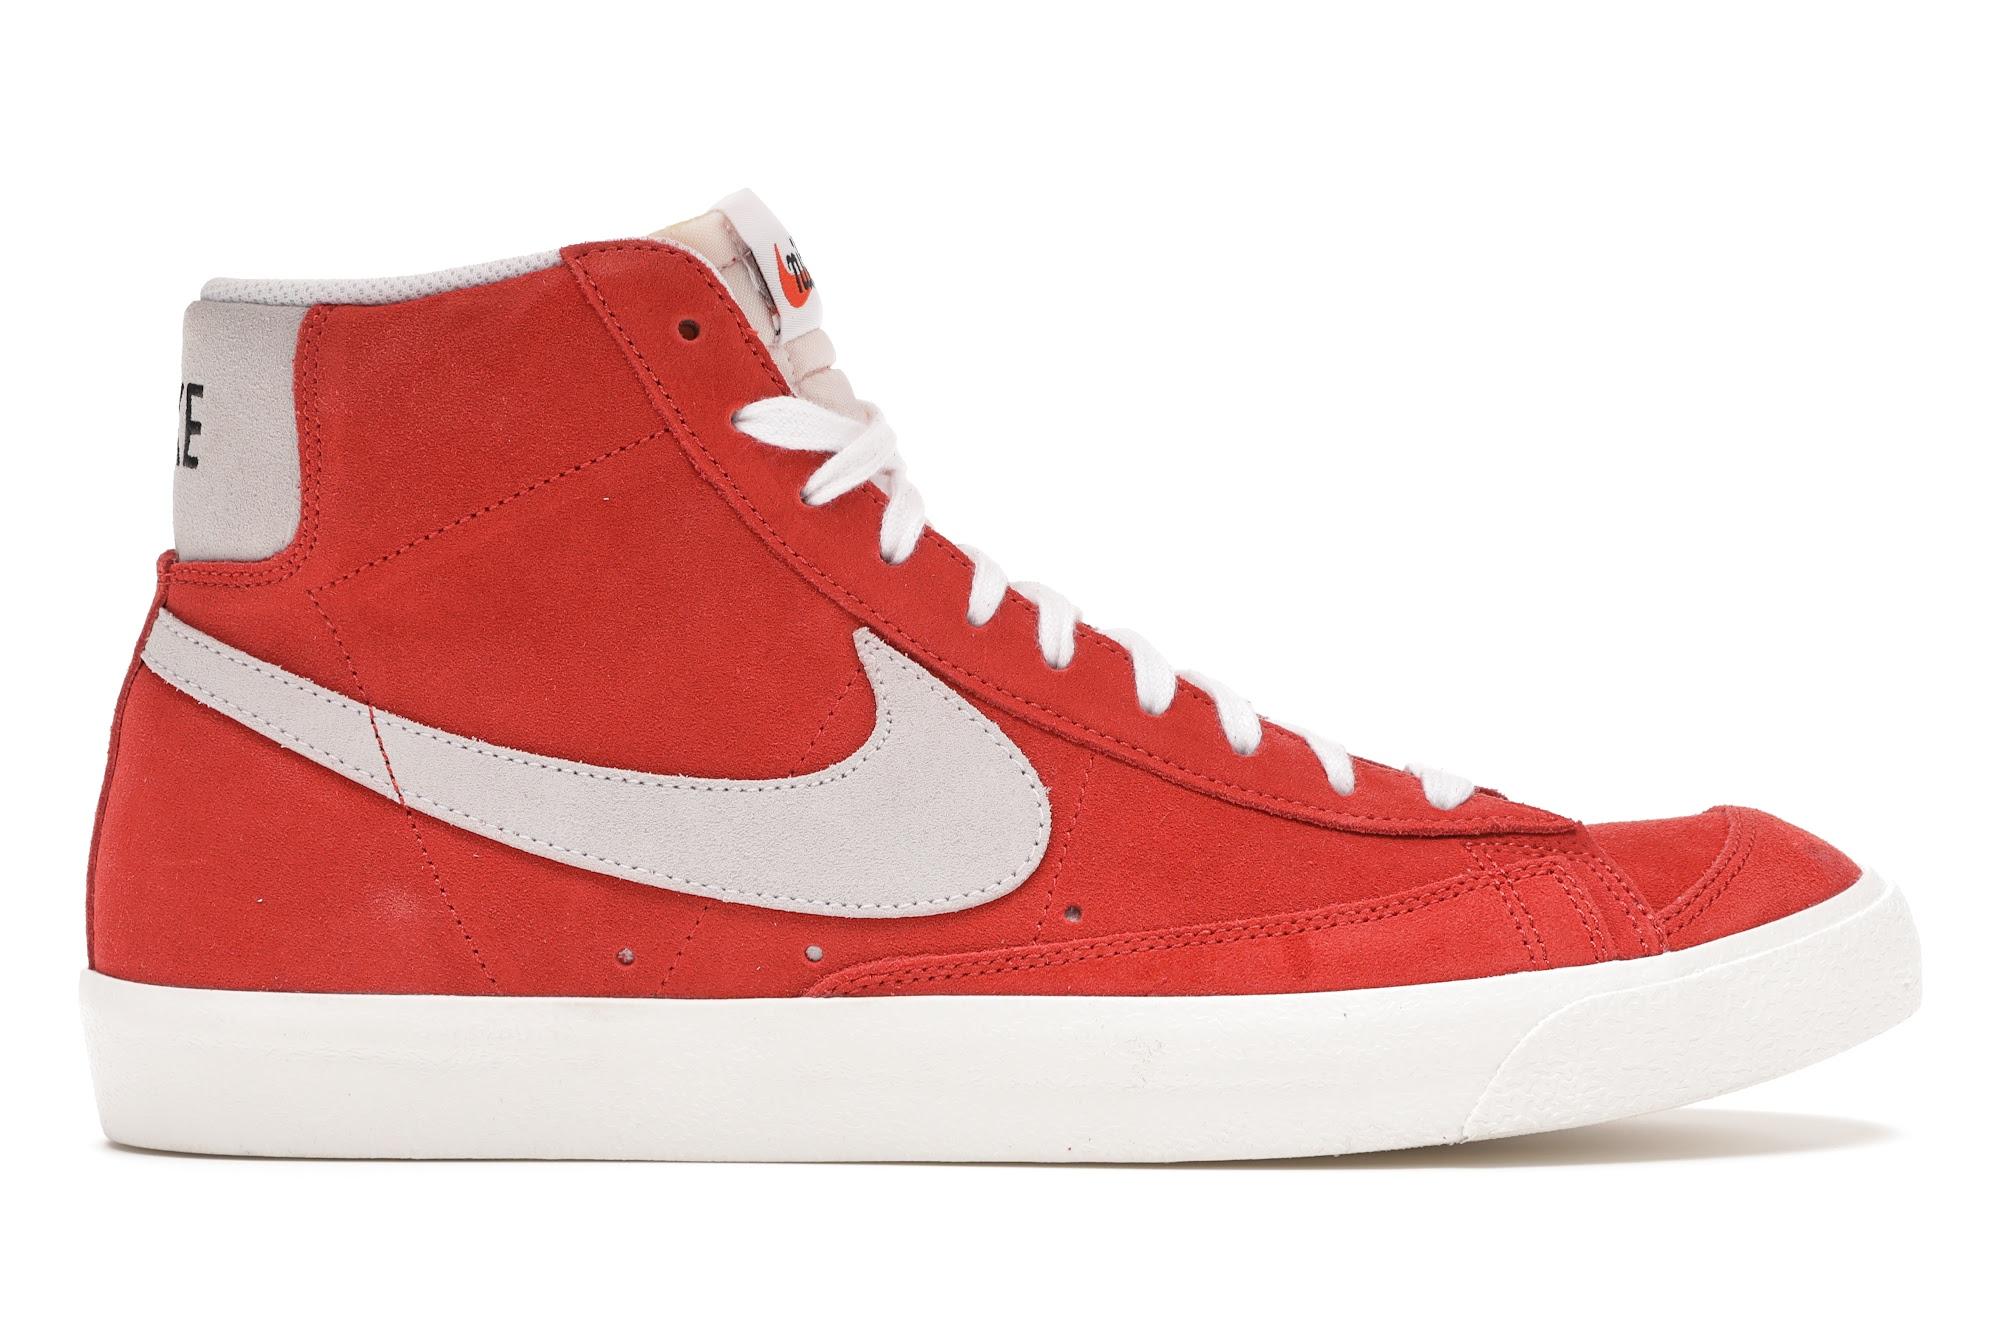 Nike Blazer Mid '77 Suede Habanero Red - CZ1088-600